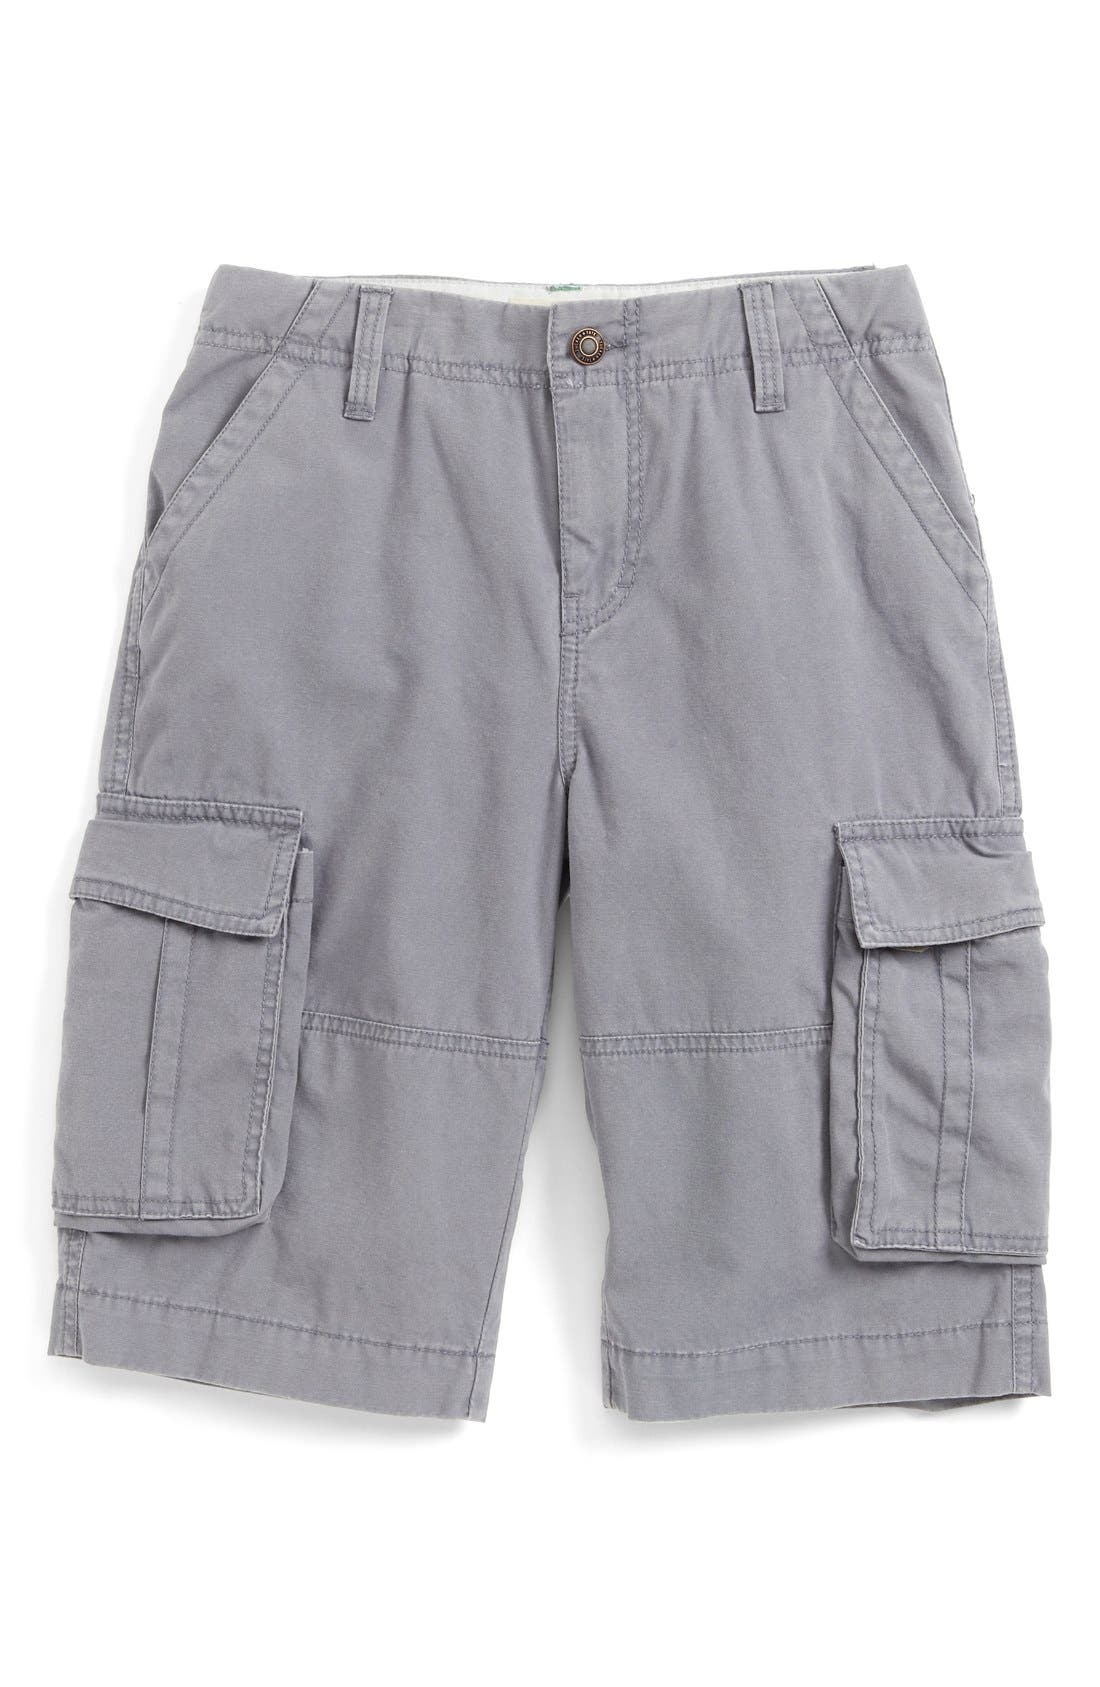 Alternate Image 1 Selected - Tucker + Tate Cargo Shorts (Little Boys)